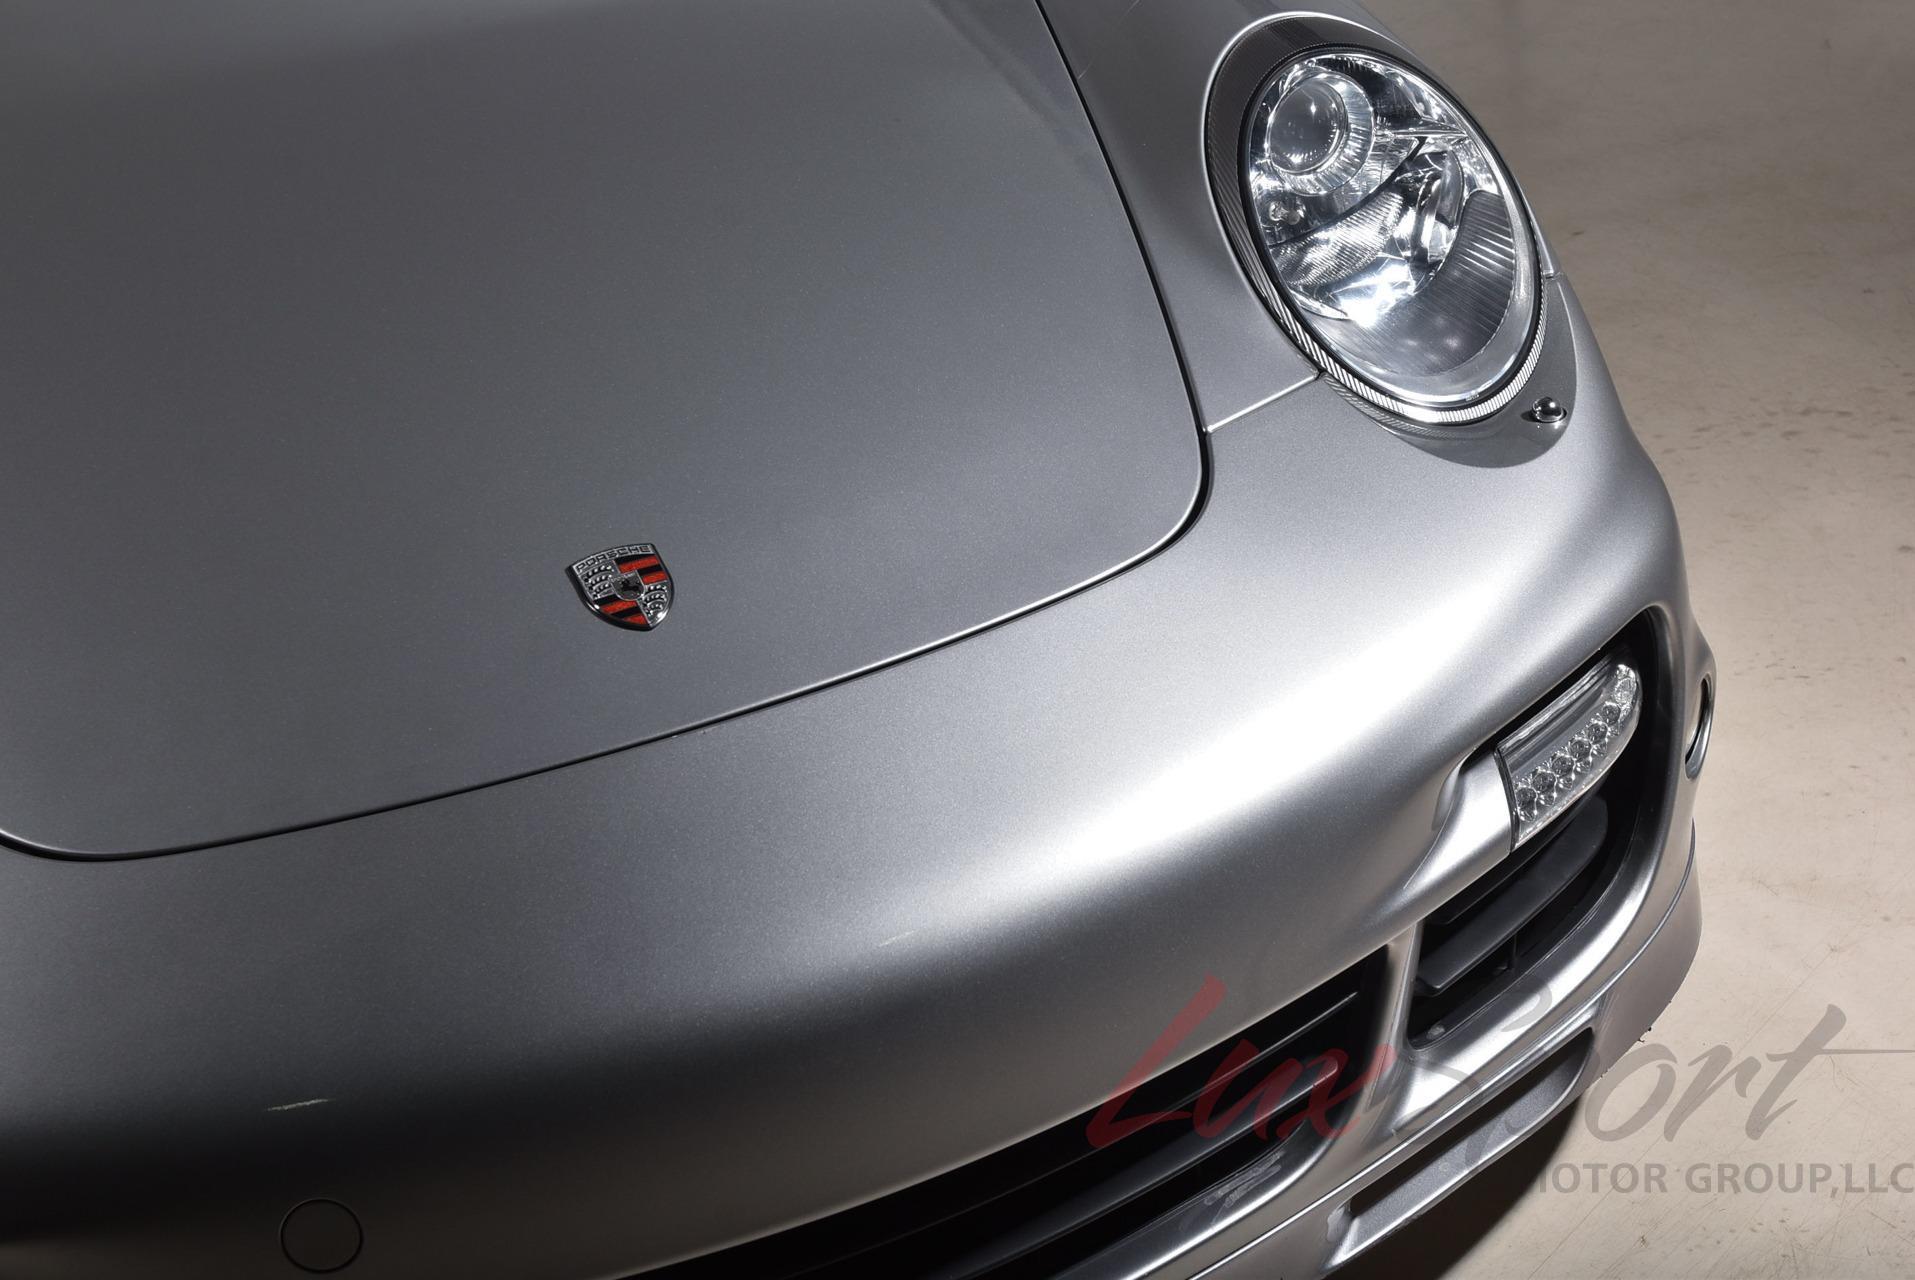 Used 2008 Porsche 911 Turbo | Syosset, NY